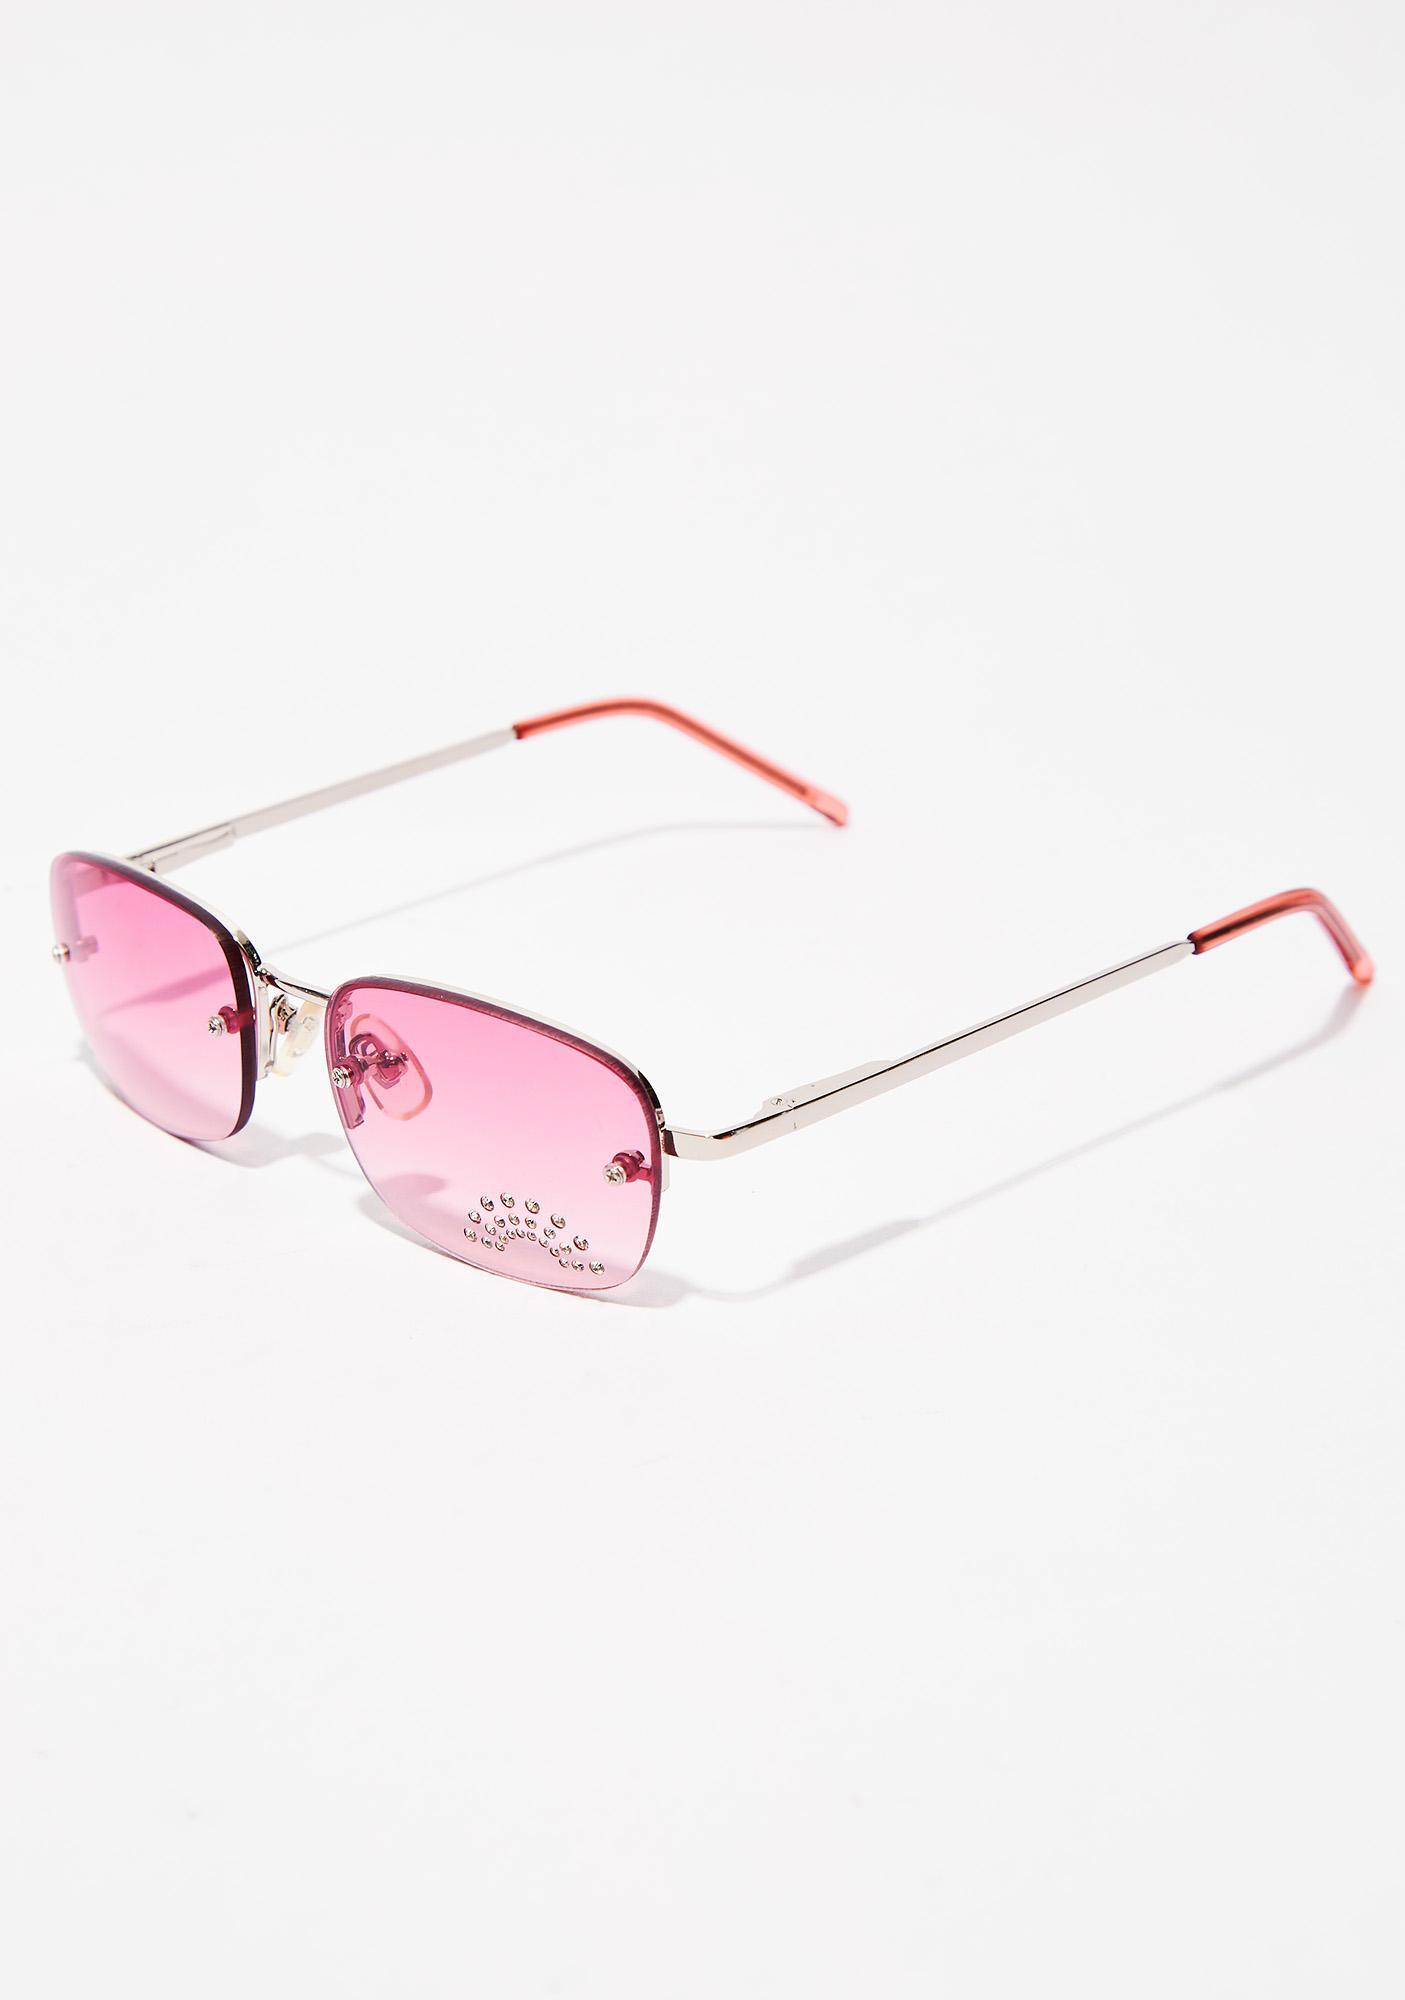 See Me Shine Sunglasses